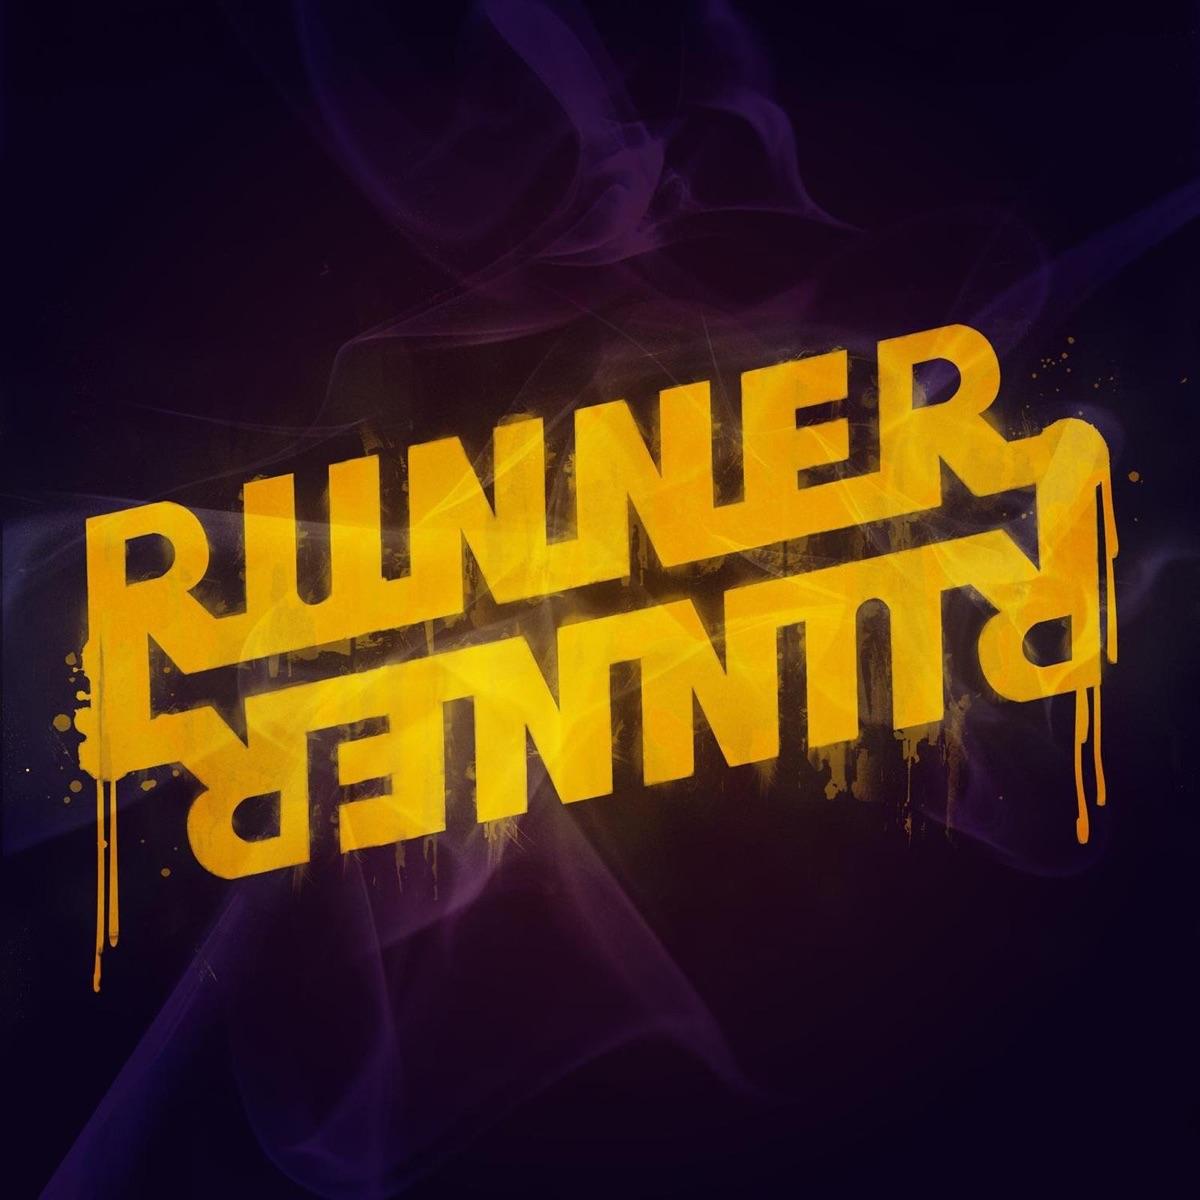 Runner Runner Runner Runner CD cover